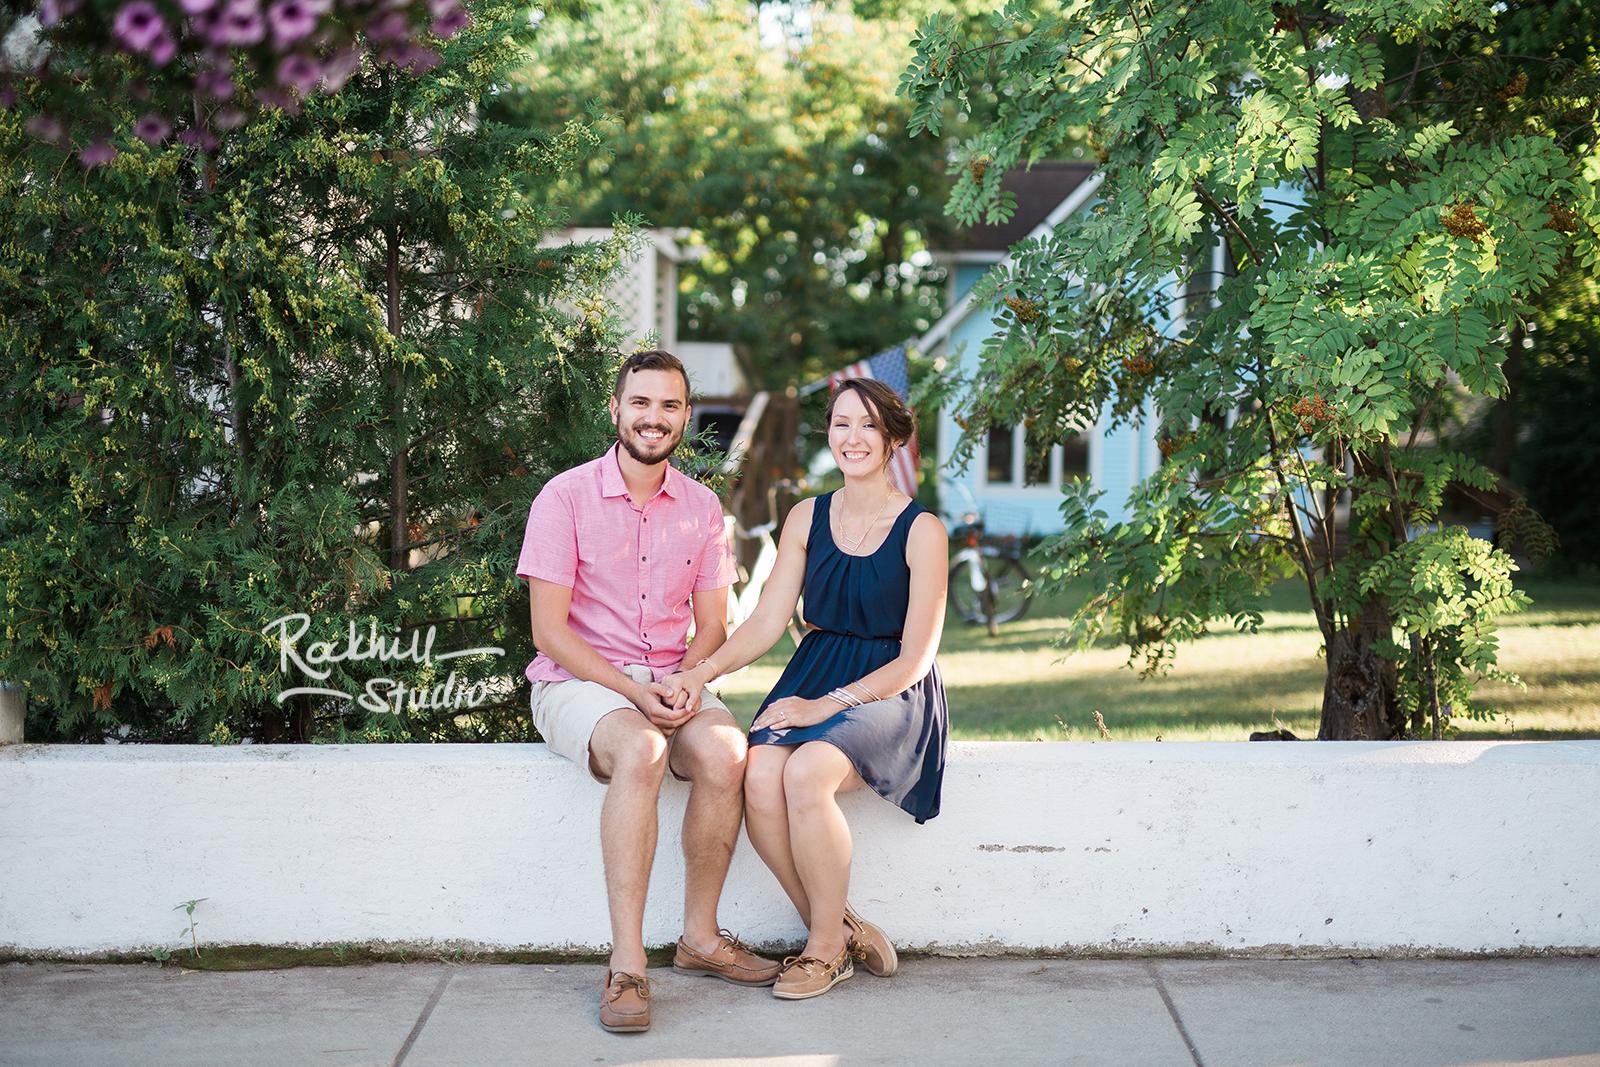 mackinac-island-wedding-engagement-northern-michigan-rockhill-studio-jt-27.jpg